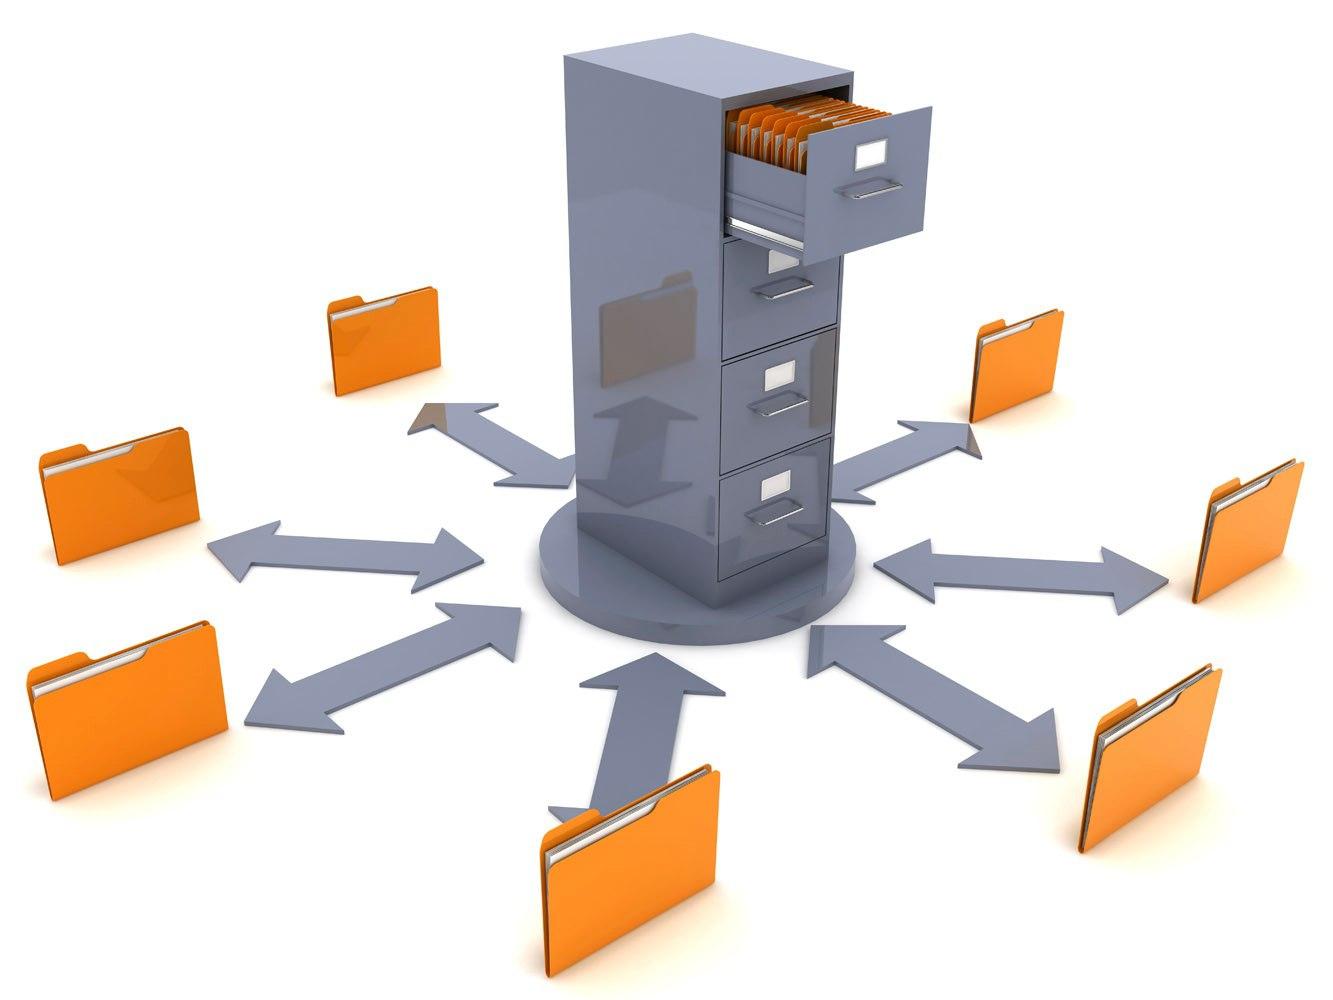 vm-specific backups